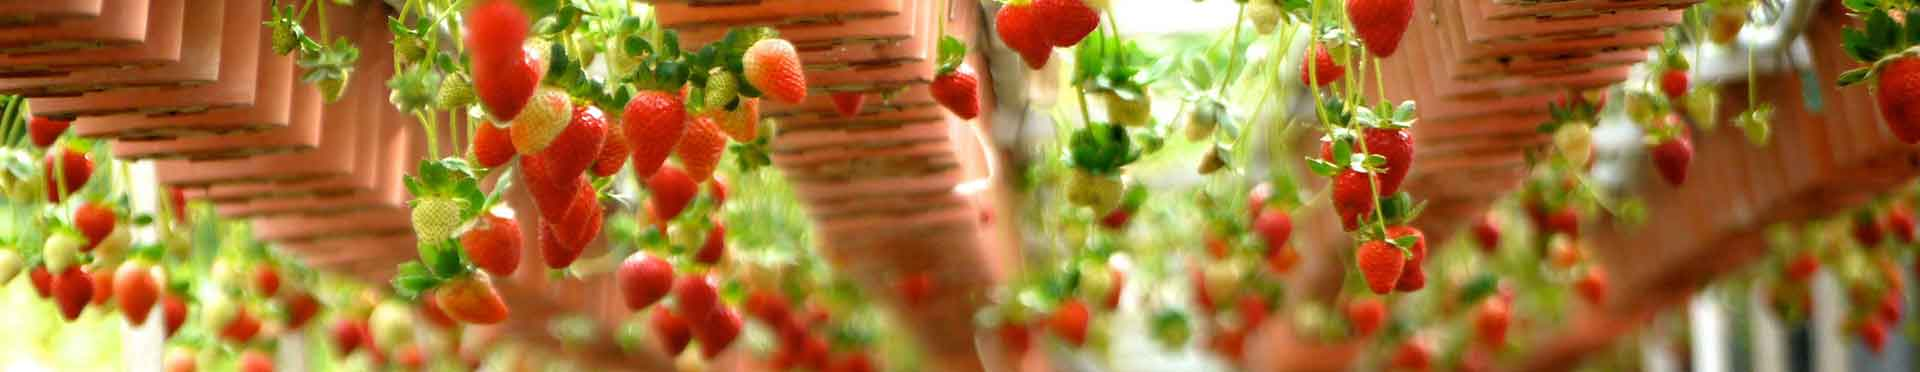 Asesoramiento de RD 506/2013 de fertilizantes para fresas